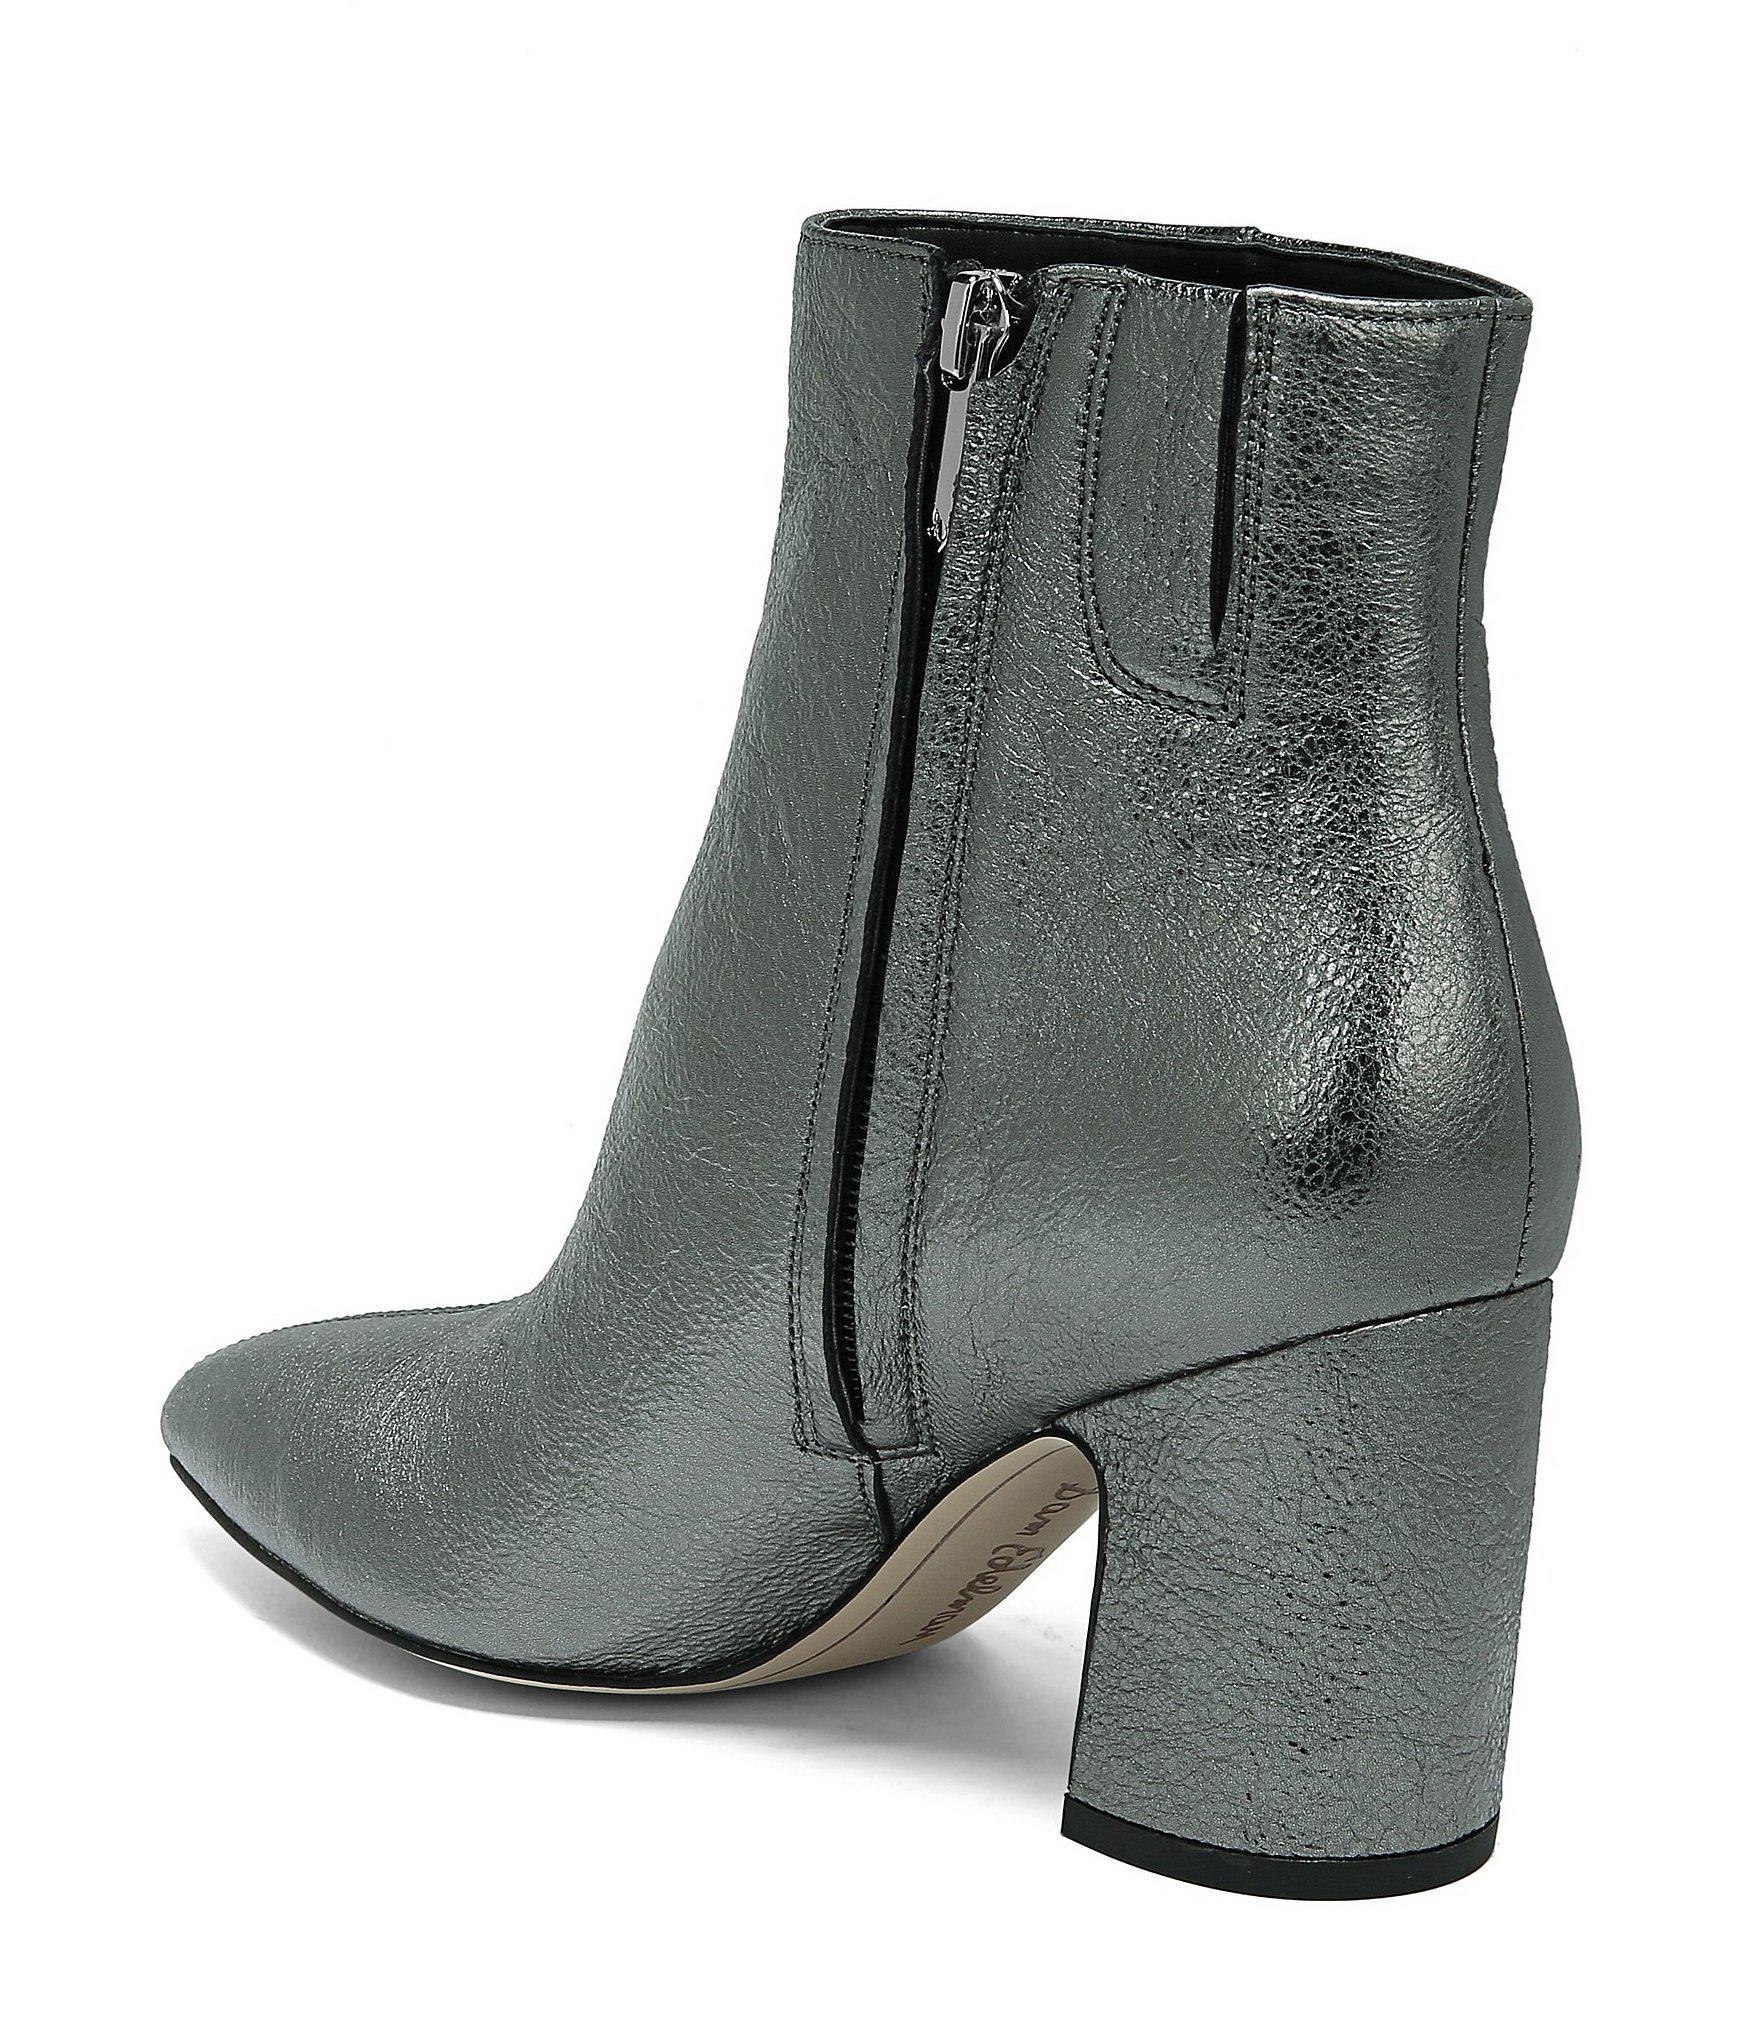 2db6307f500418 Lyst - Sam Edelman Hilty Pointy Leather Booties